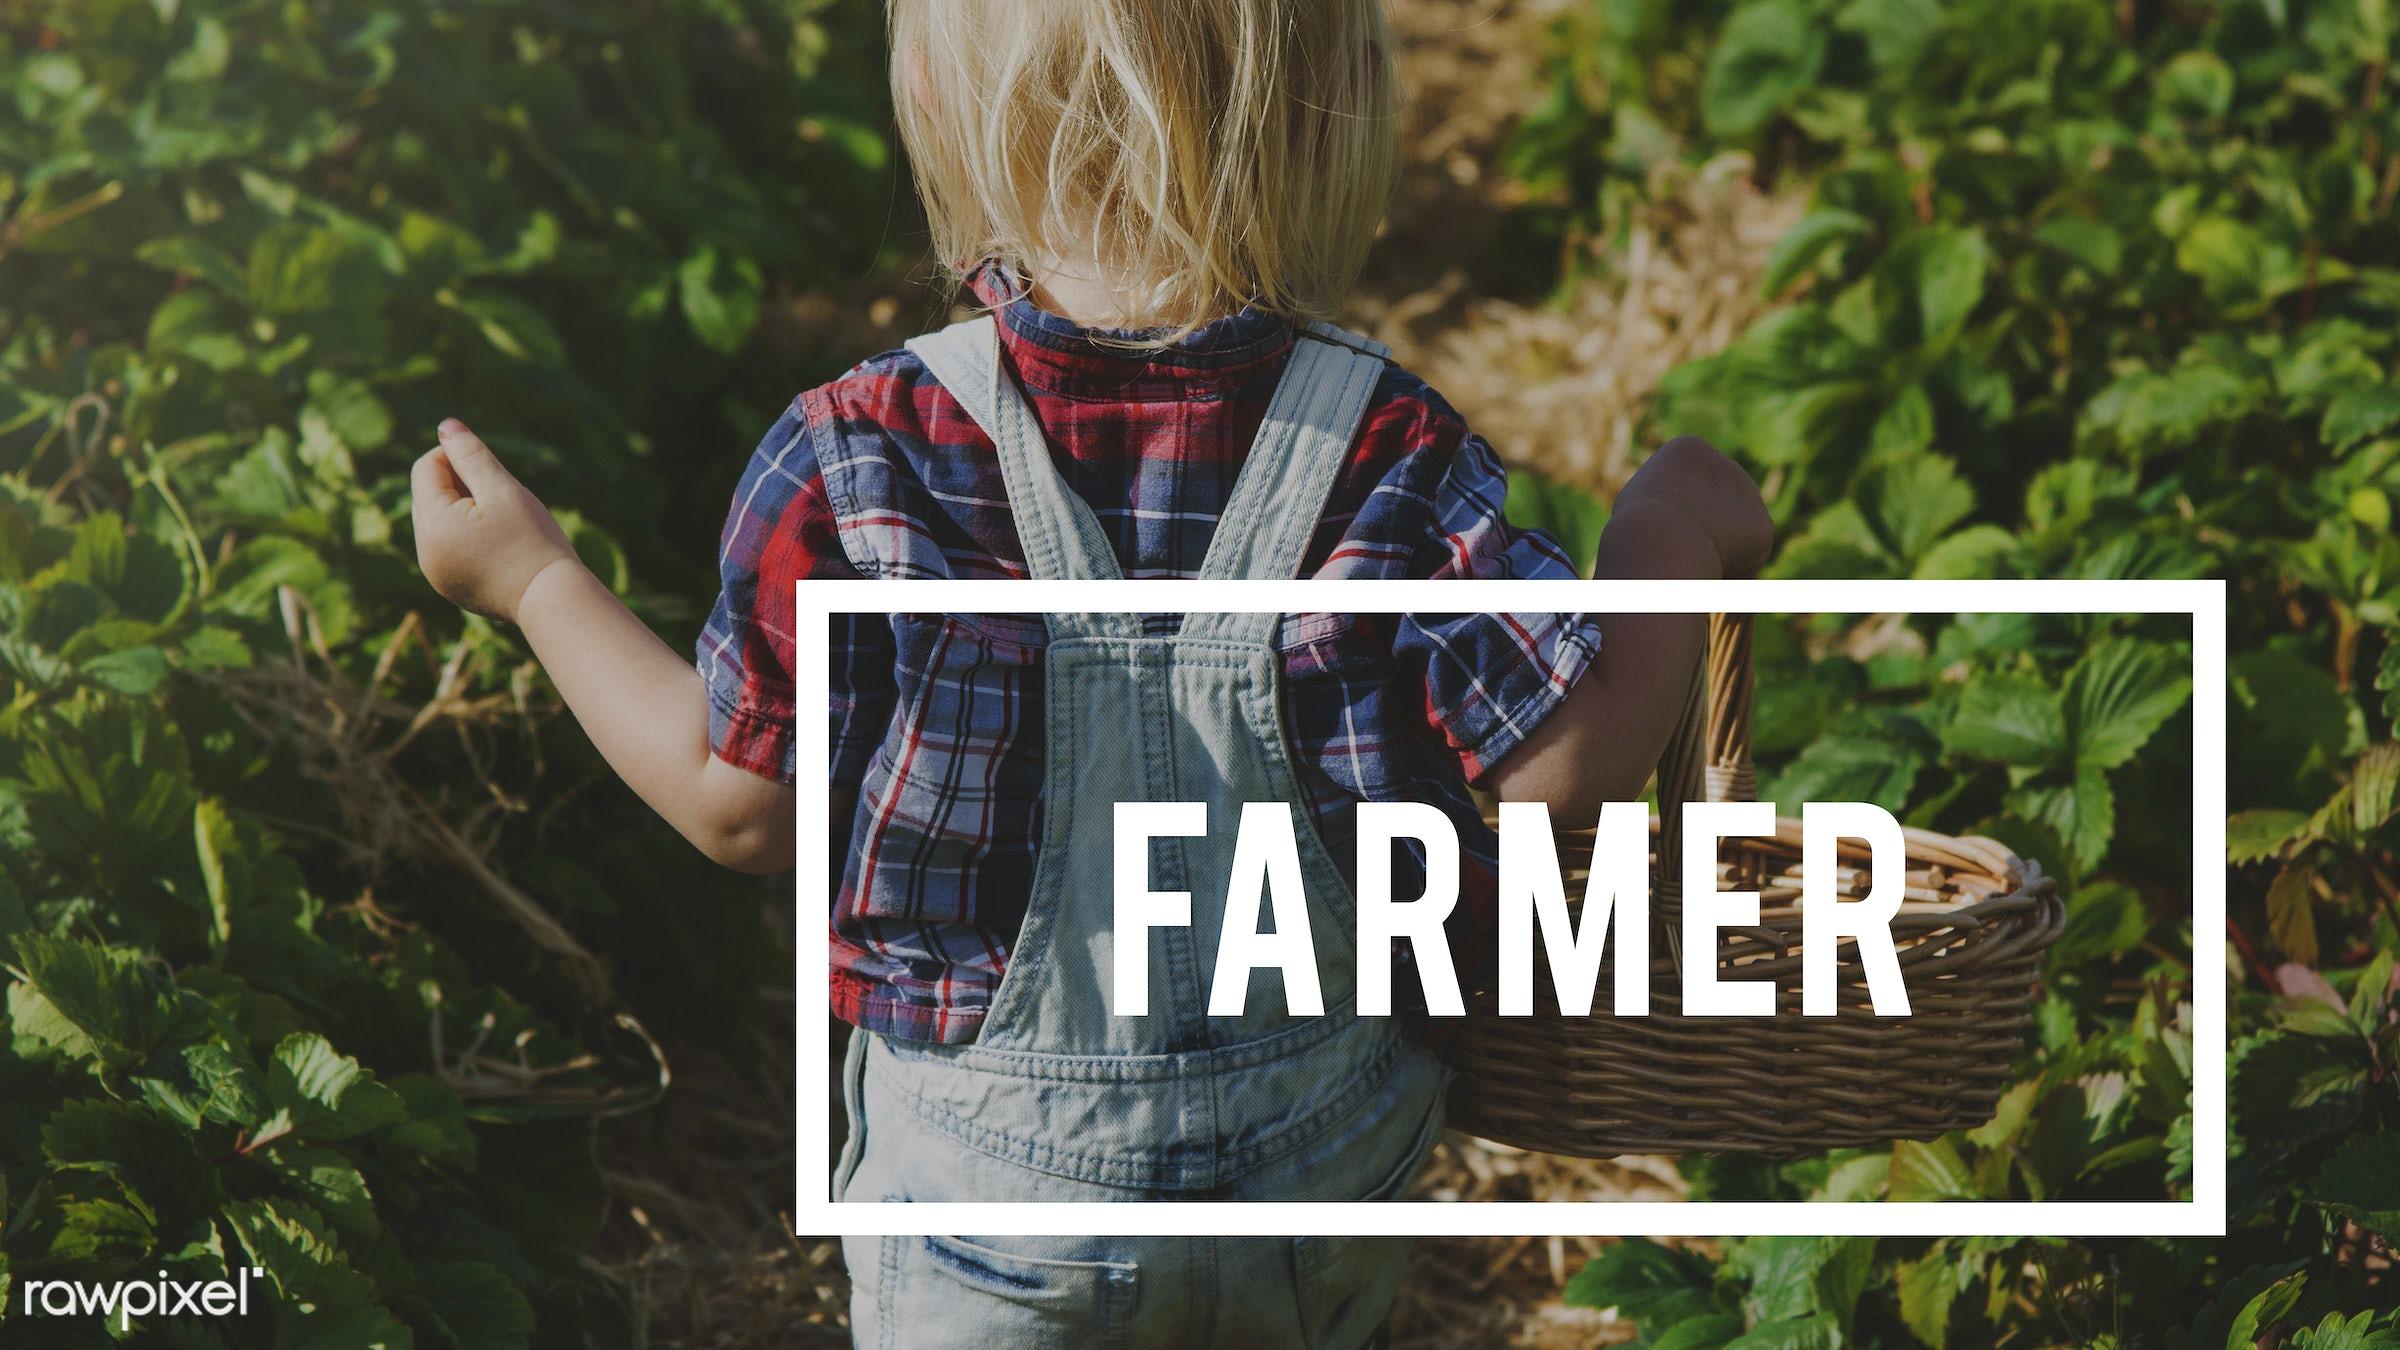 planting, basket, blonde, boy, caucasian, dungarees, eco, ecology, environment, environmental, farm, farmer, farming, fruit...